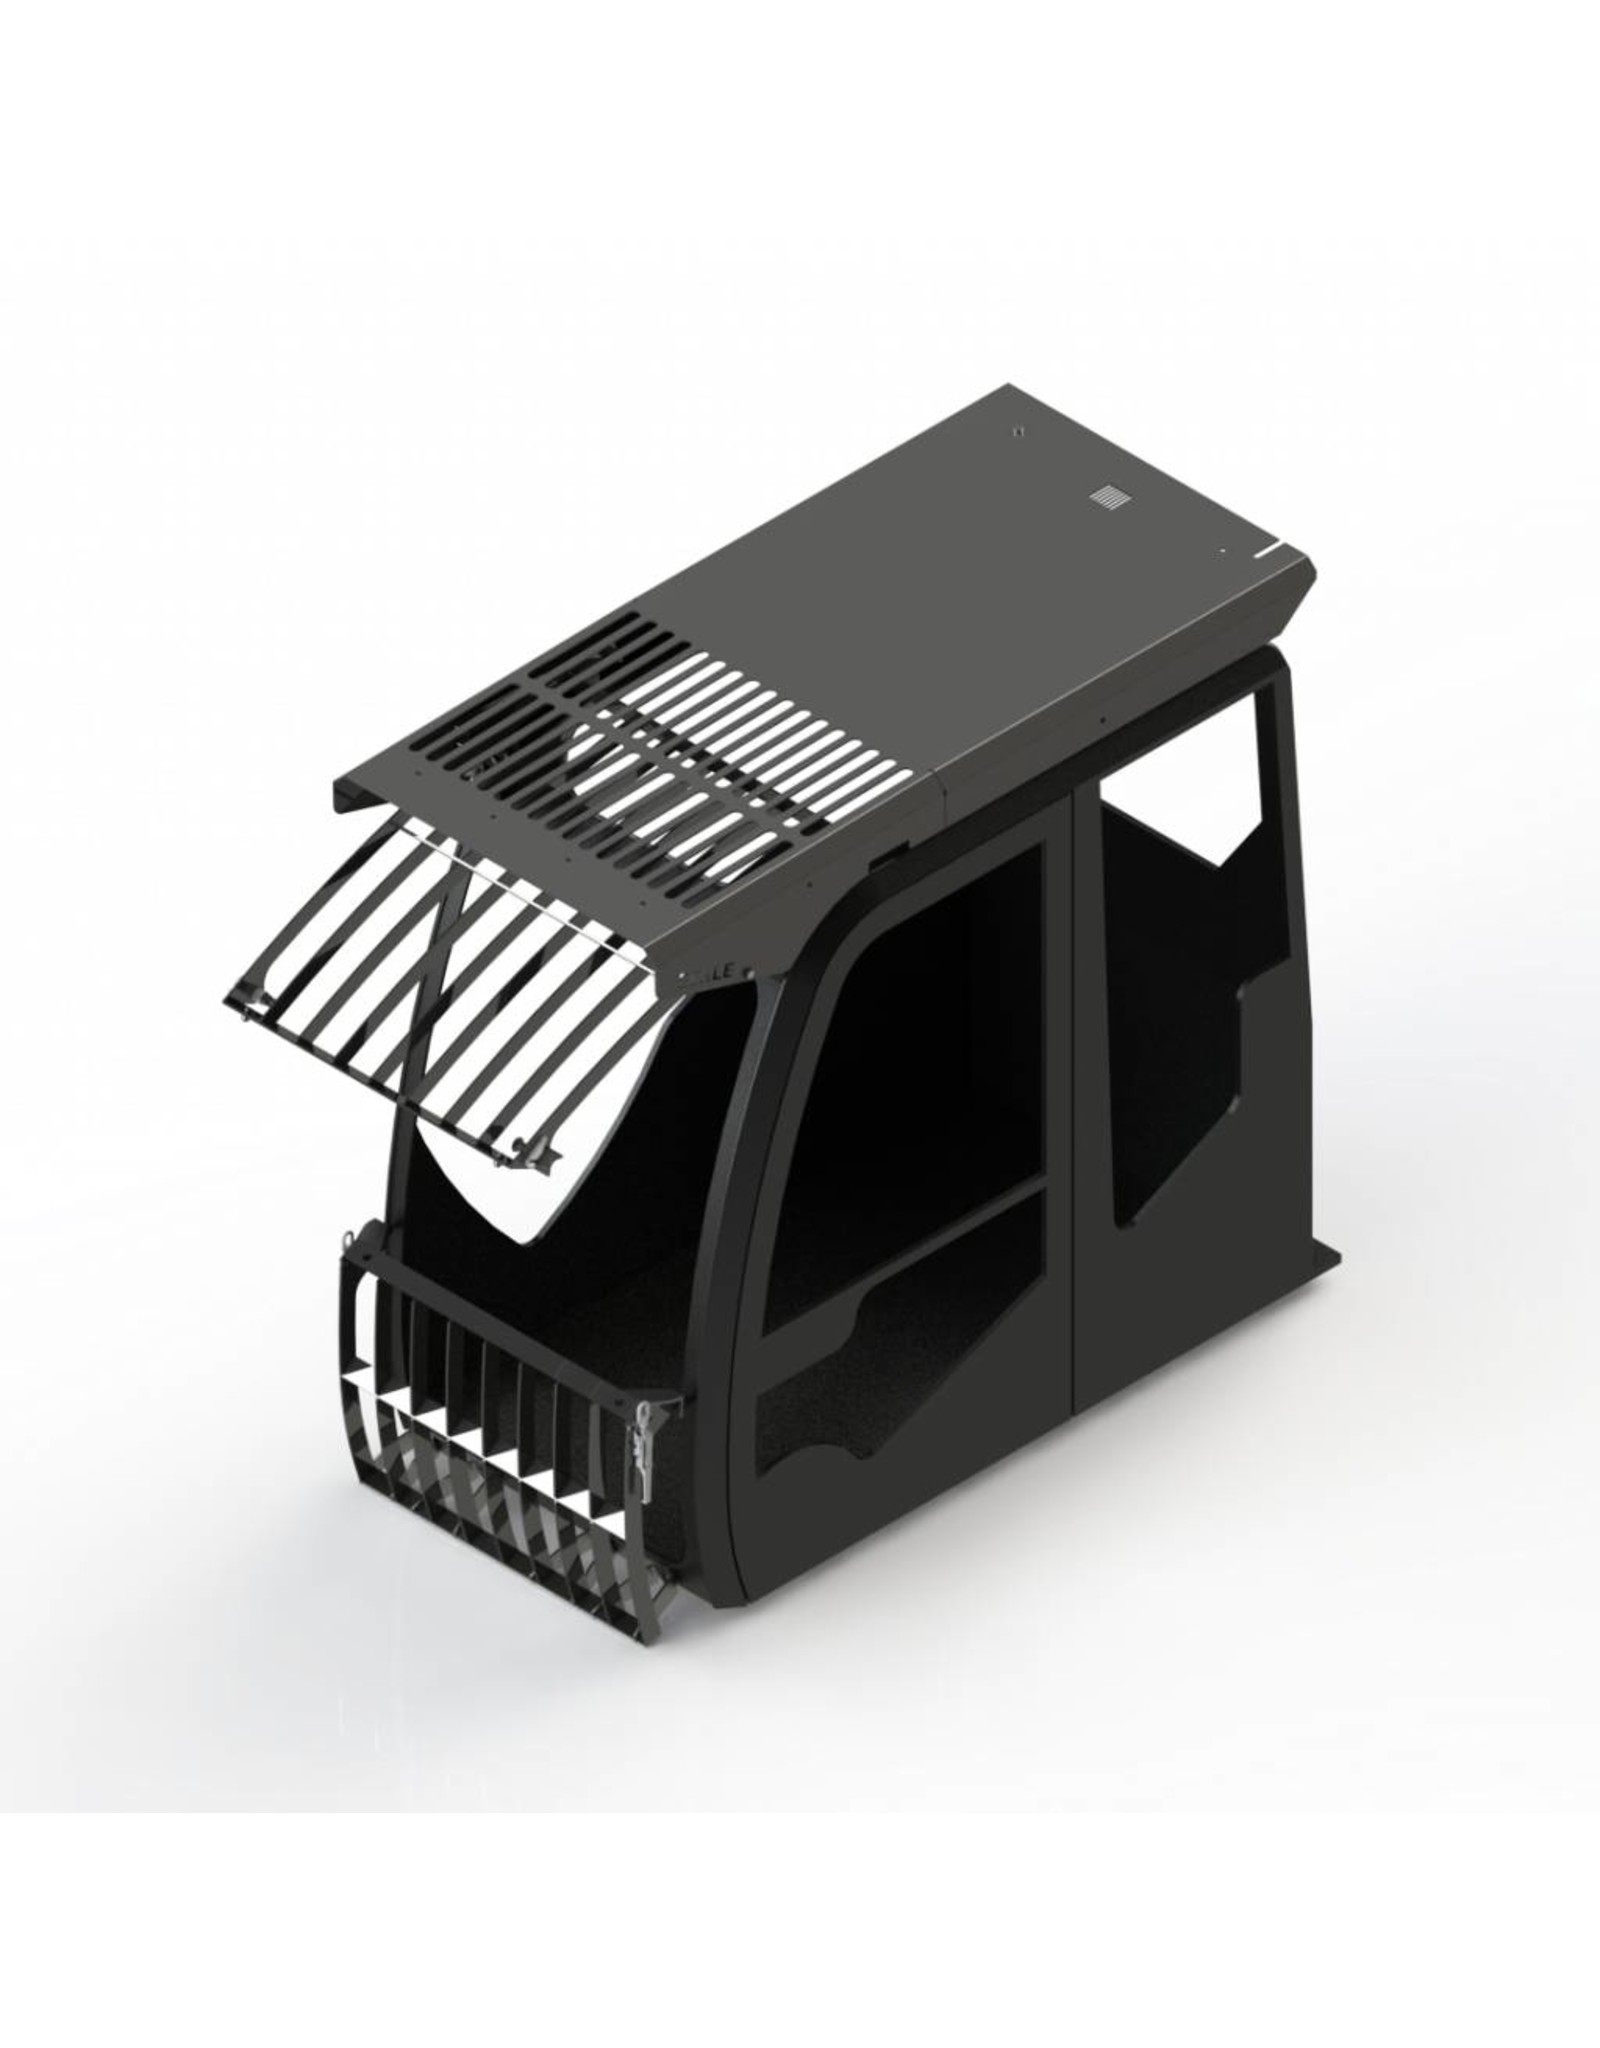 Echle Hartstahl GmbH FOPS for Komatsu PC170LC-10/11